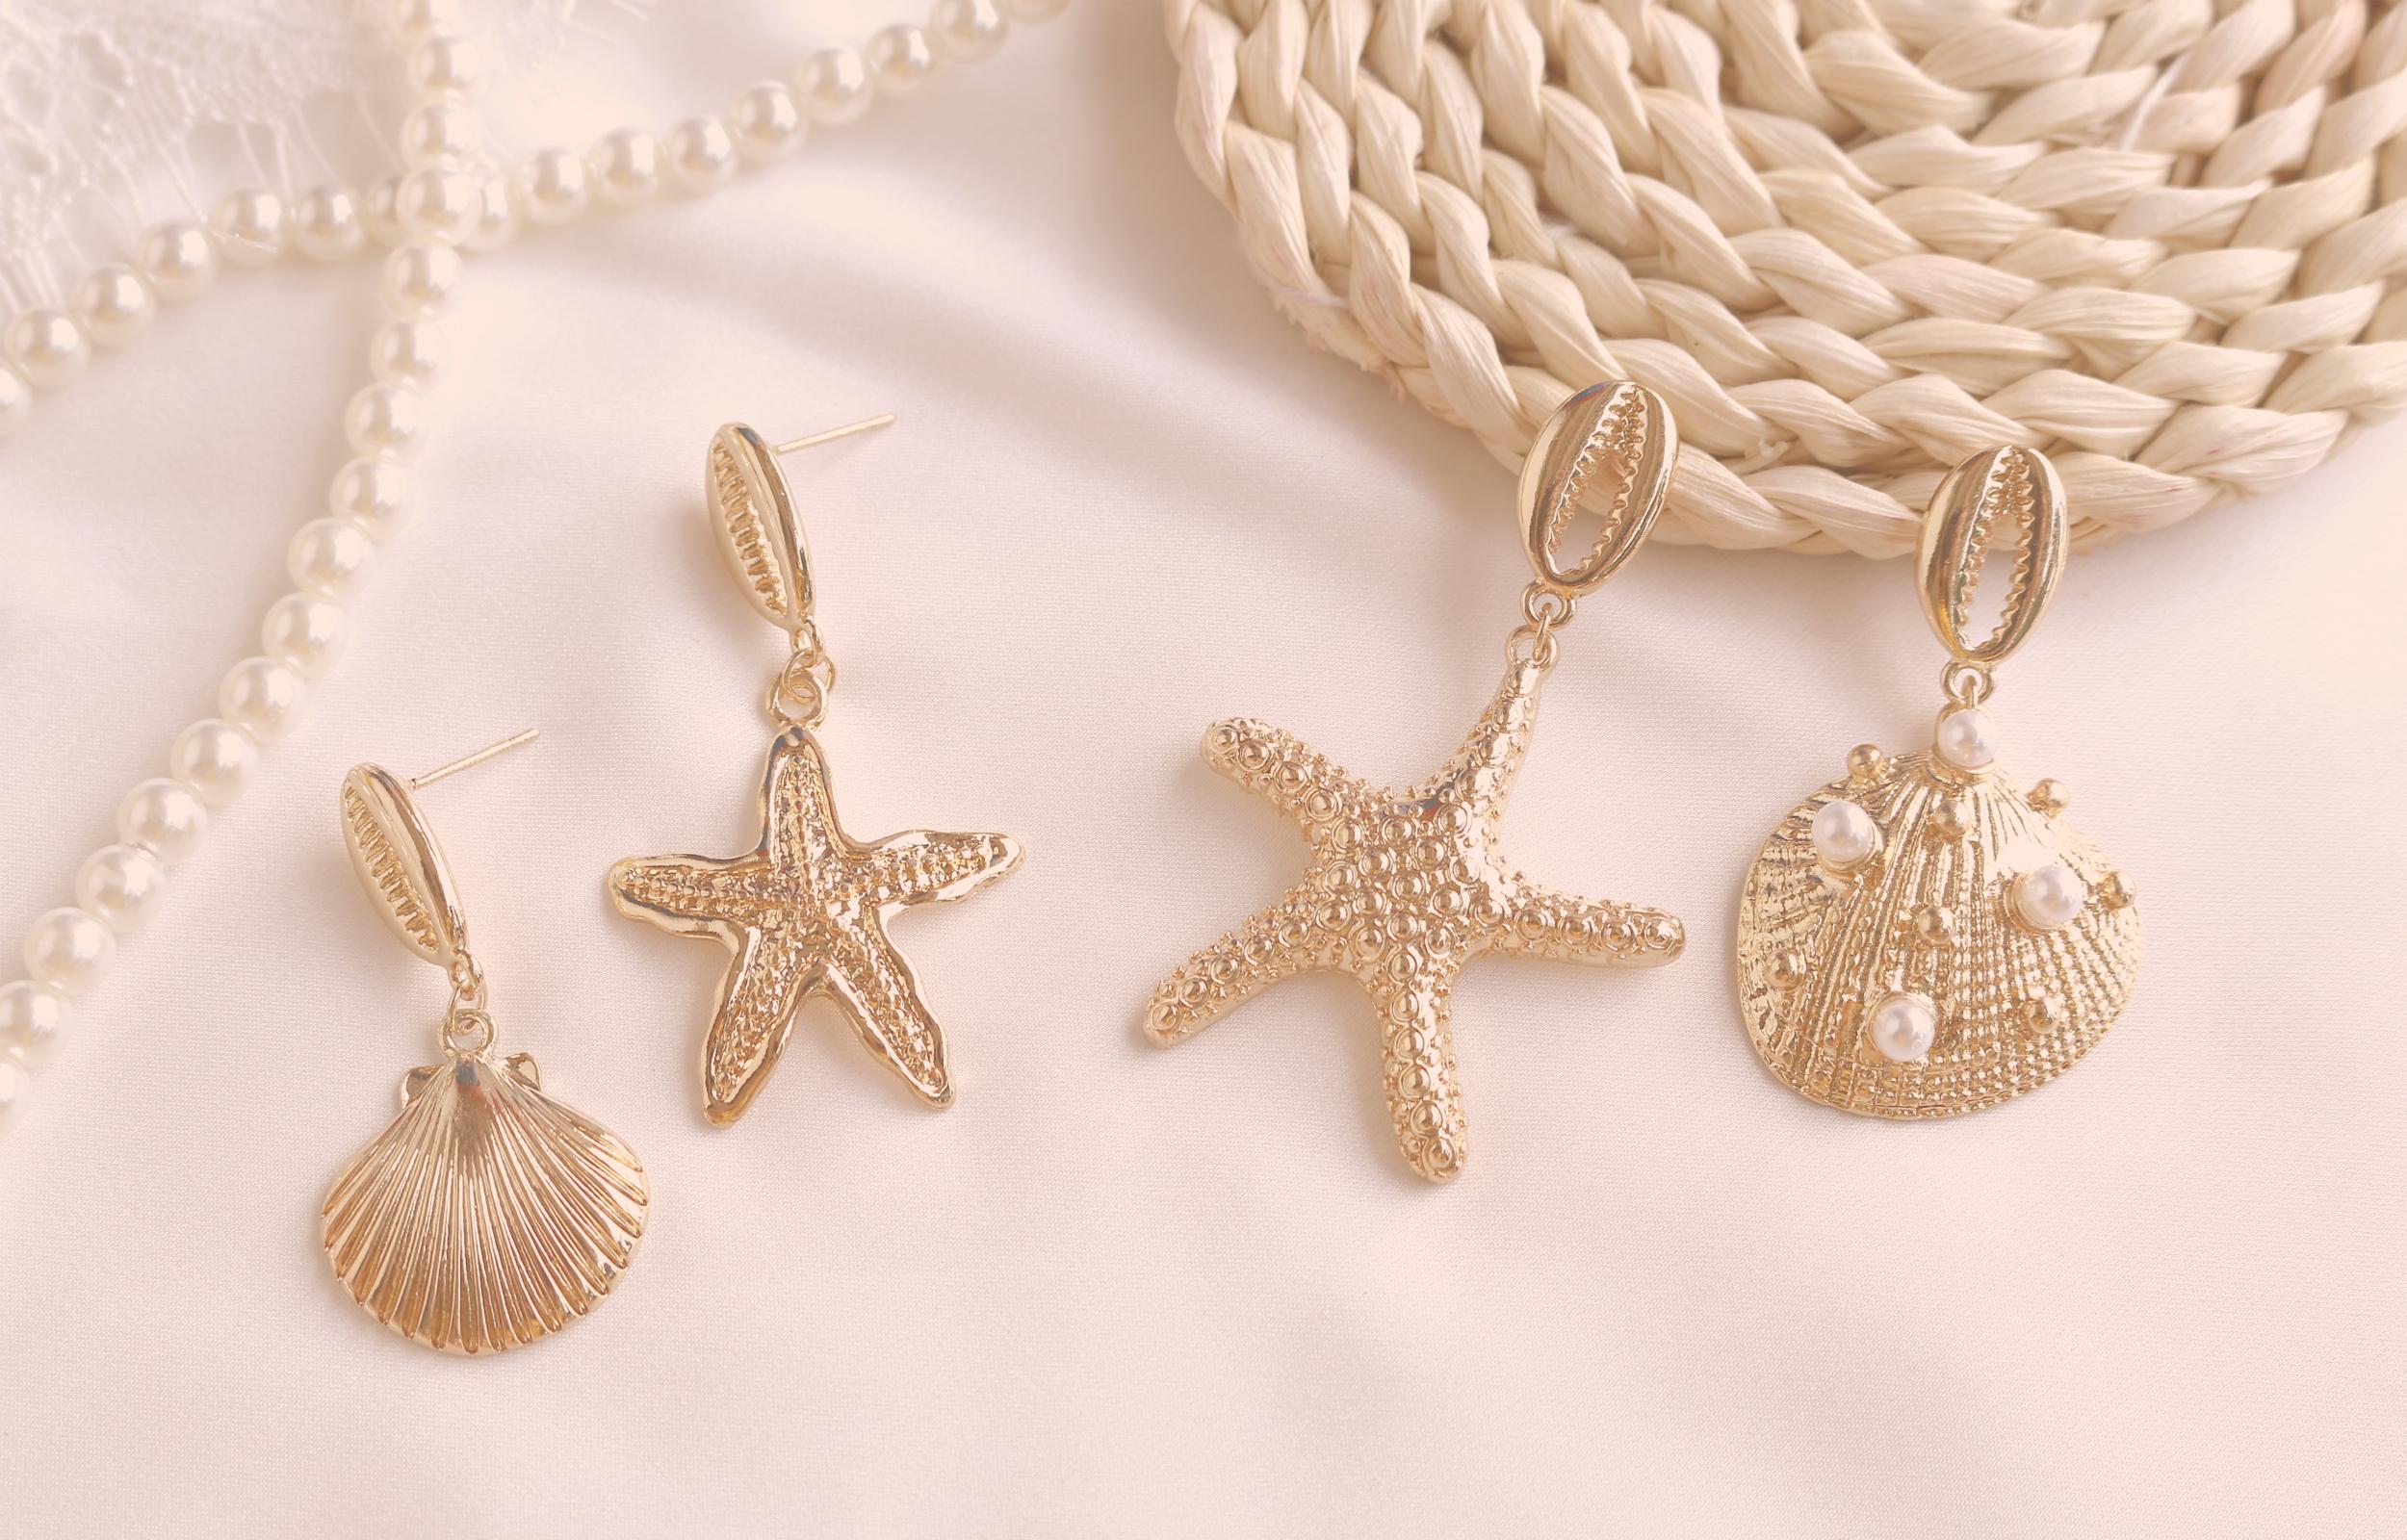 b2e391a31 Women Accessories Online   Plenty Jewelry   NEW TRENDS